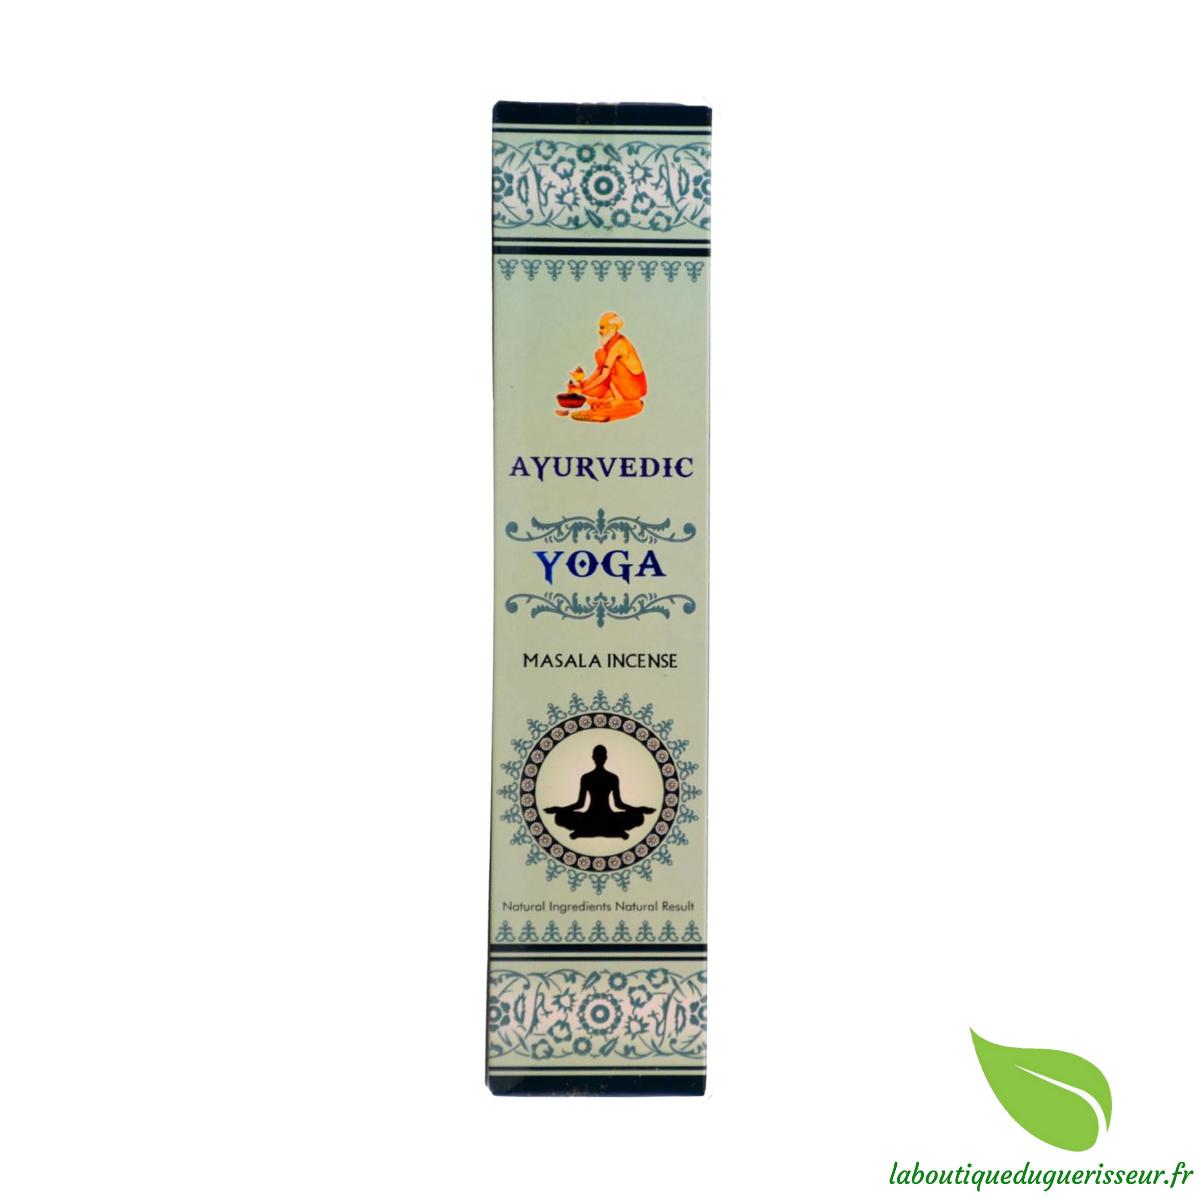 Encens Ayurvedic - Yoga